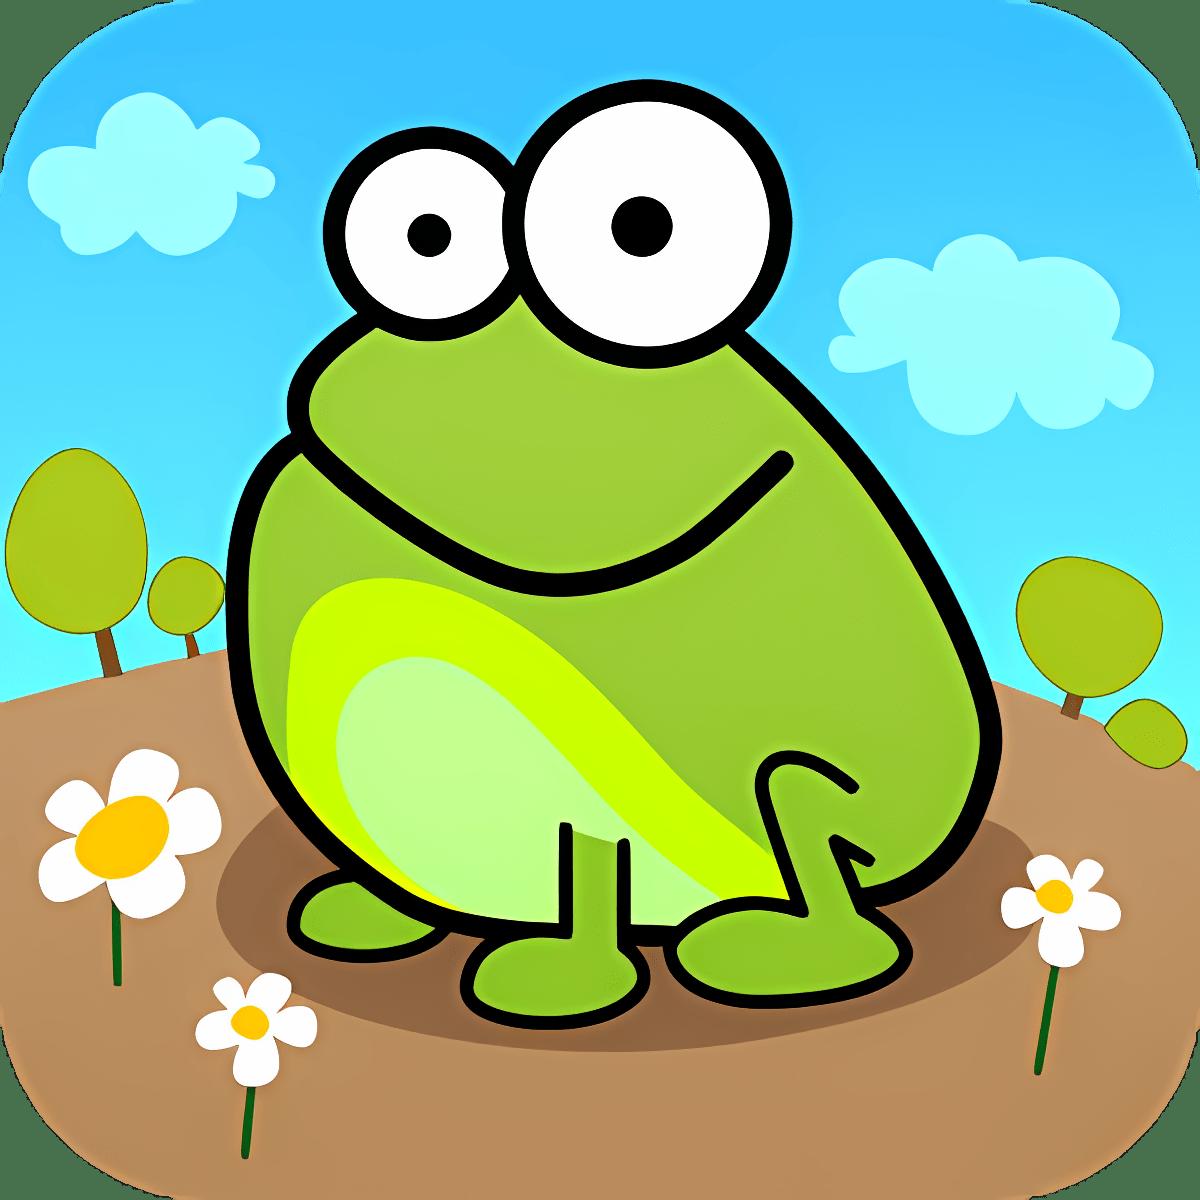 Frog jump 1